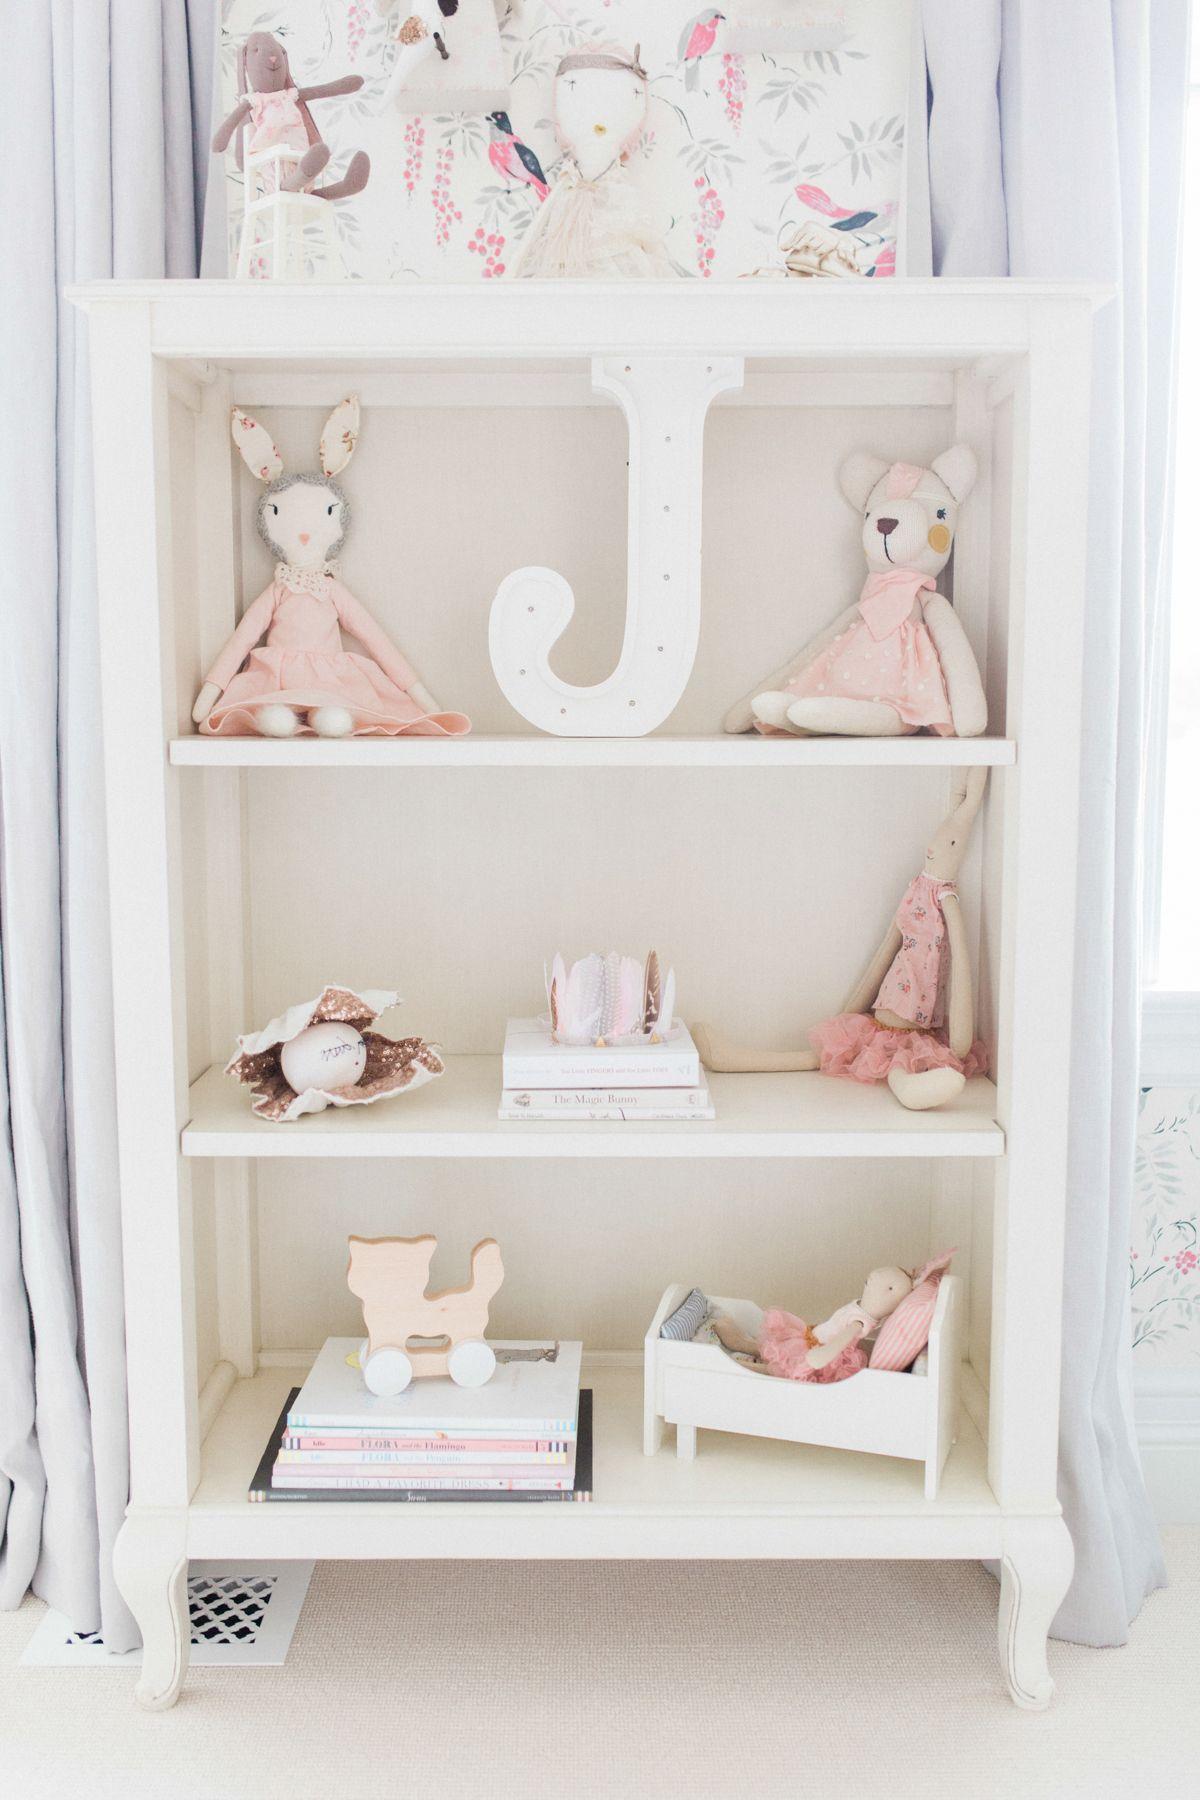 Juniper S Vintagey Bird Wallpaper Nursery Project Nursery Nursery Shelves Nursery Room Design Girl Nursery